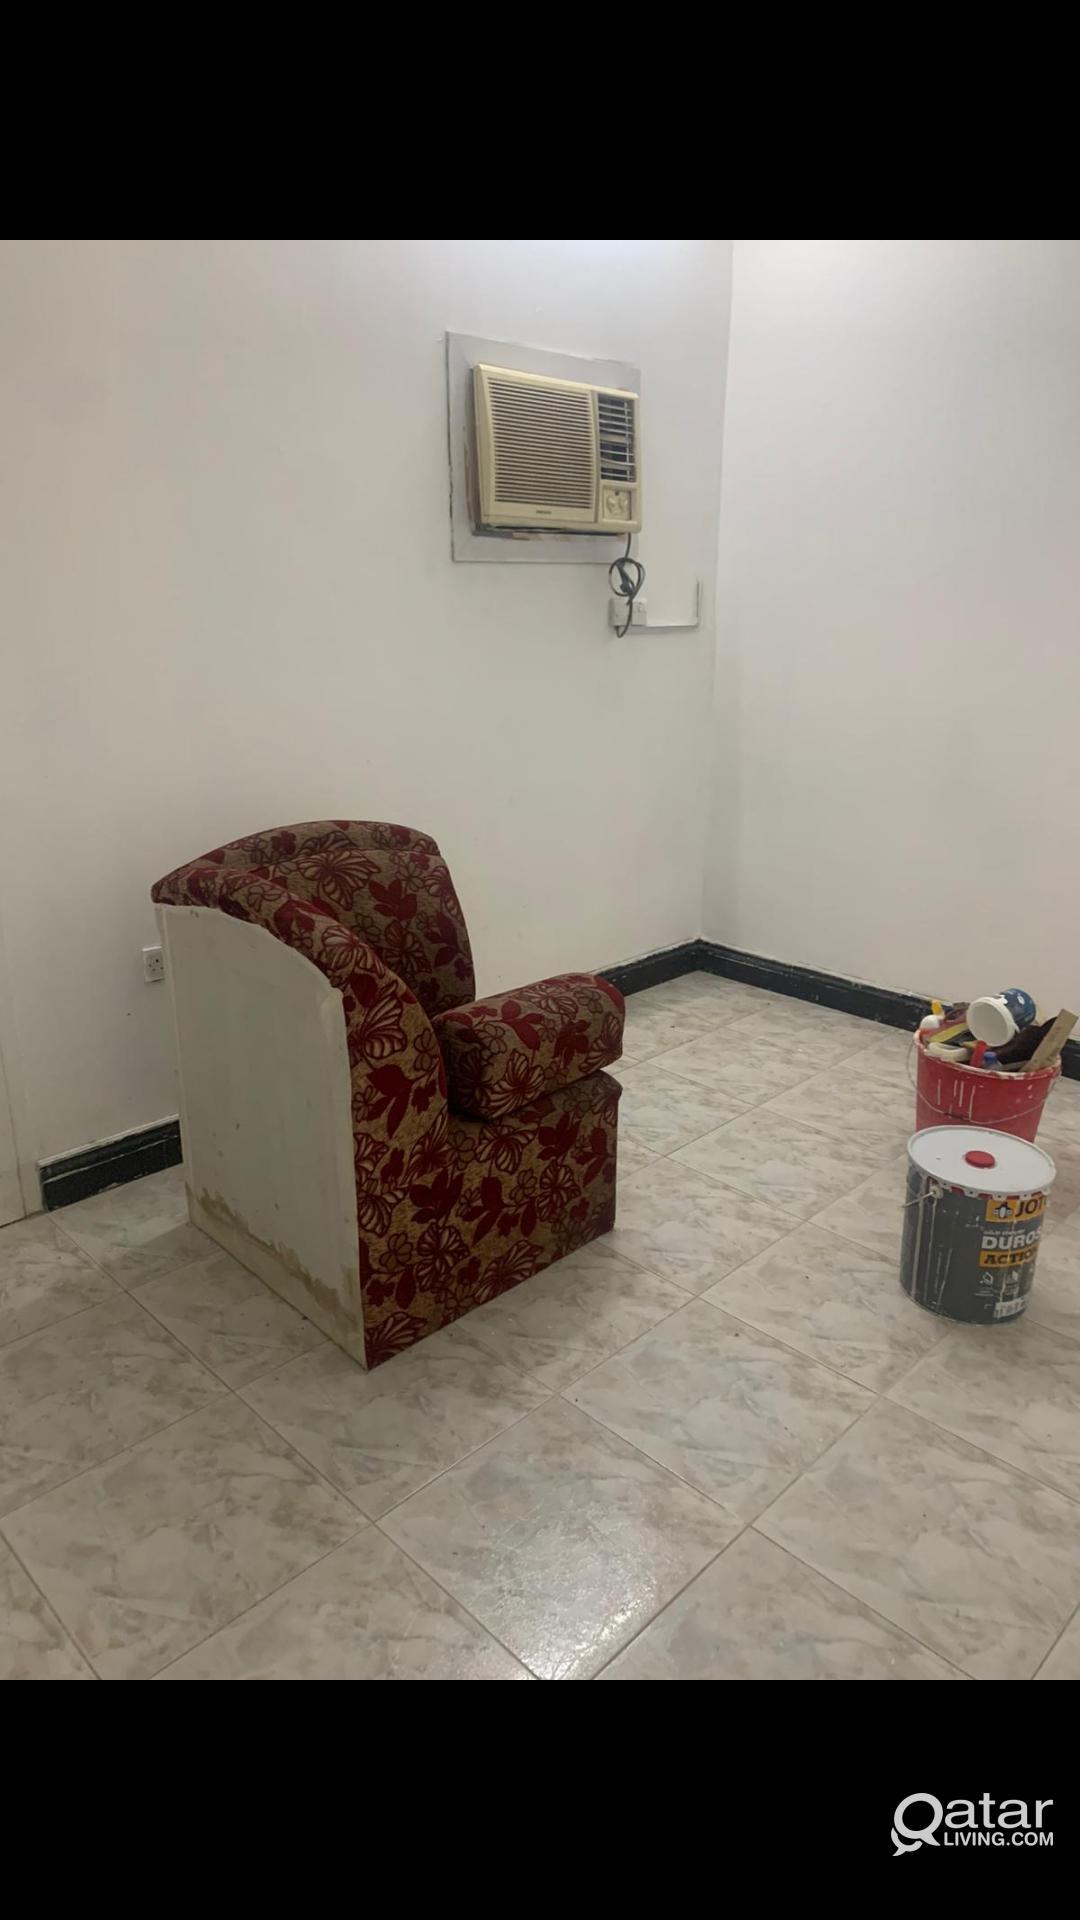 STUDIO ROOM NEAR ICC AND BACK SIDE OF DAR UL SALAM